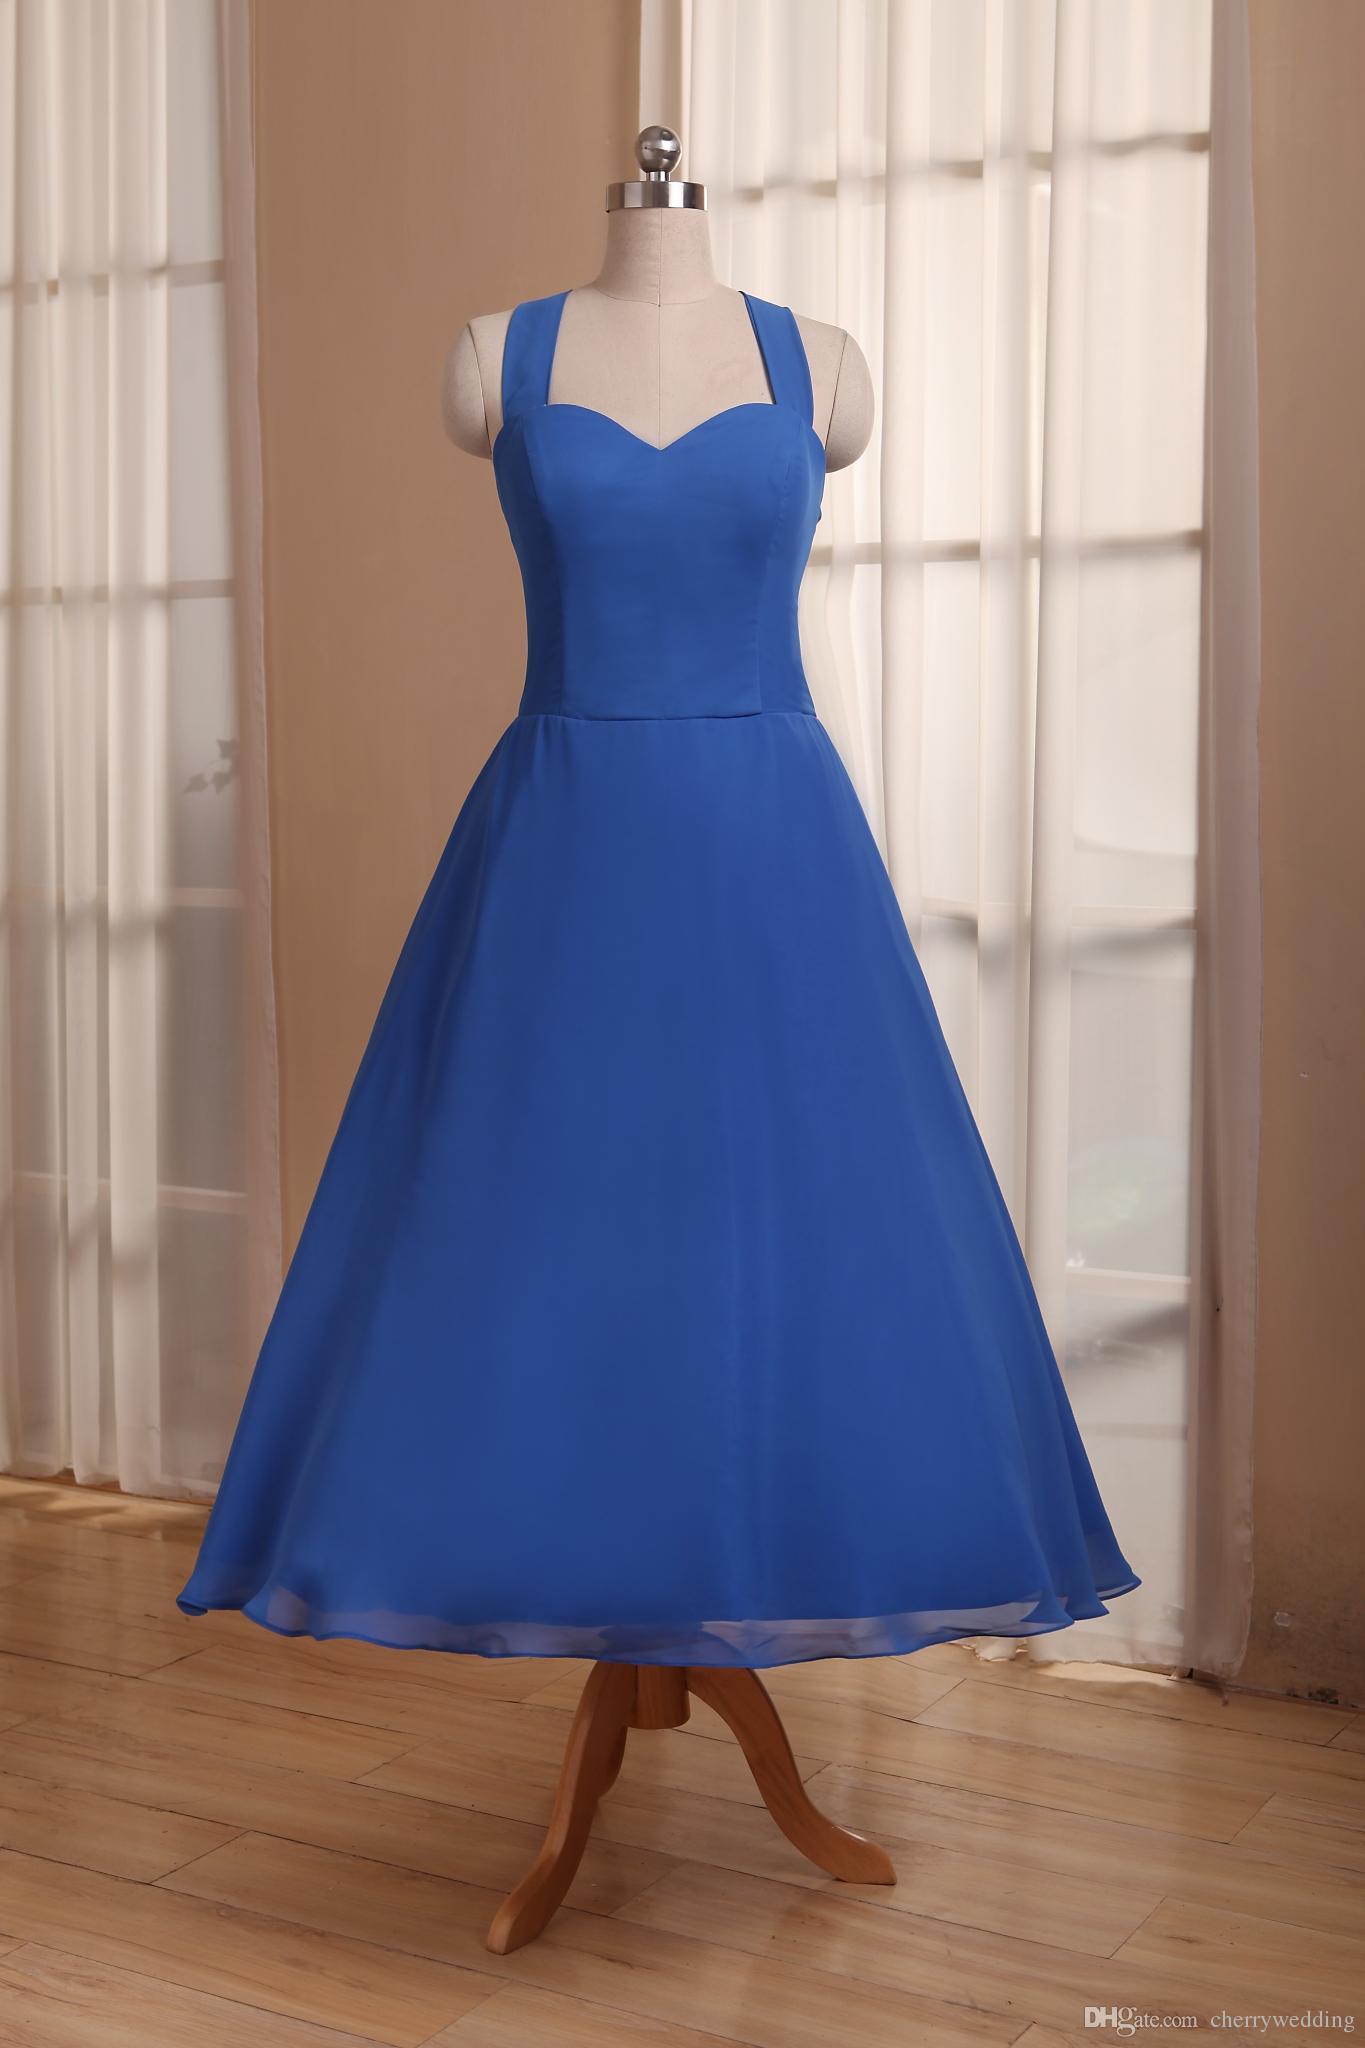 Retro Aqua Bridesmaid Dresses